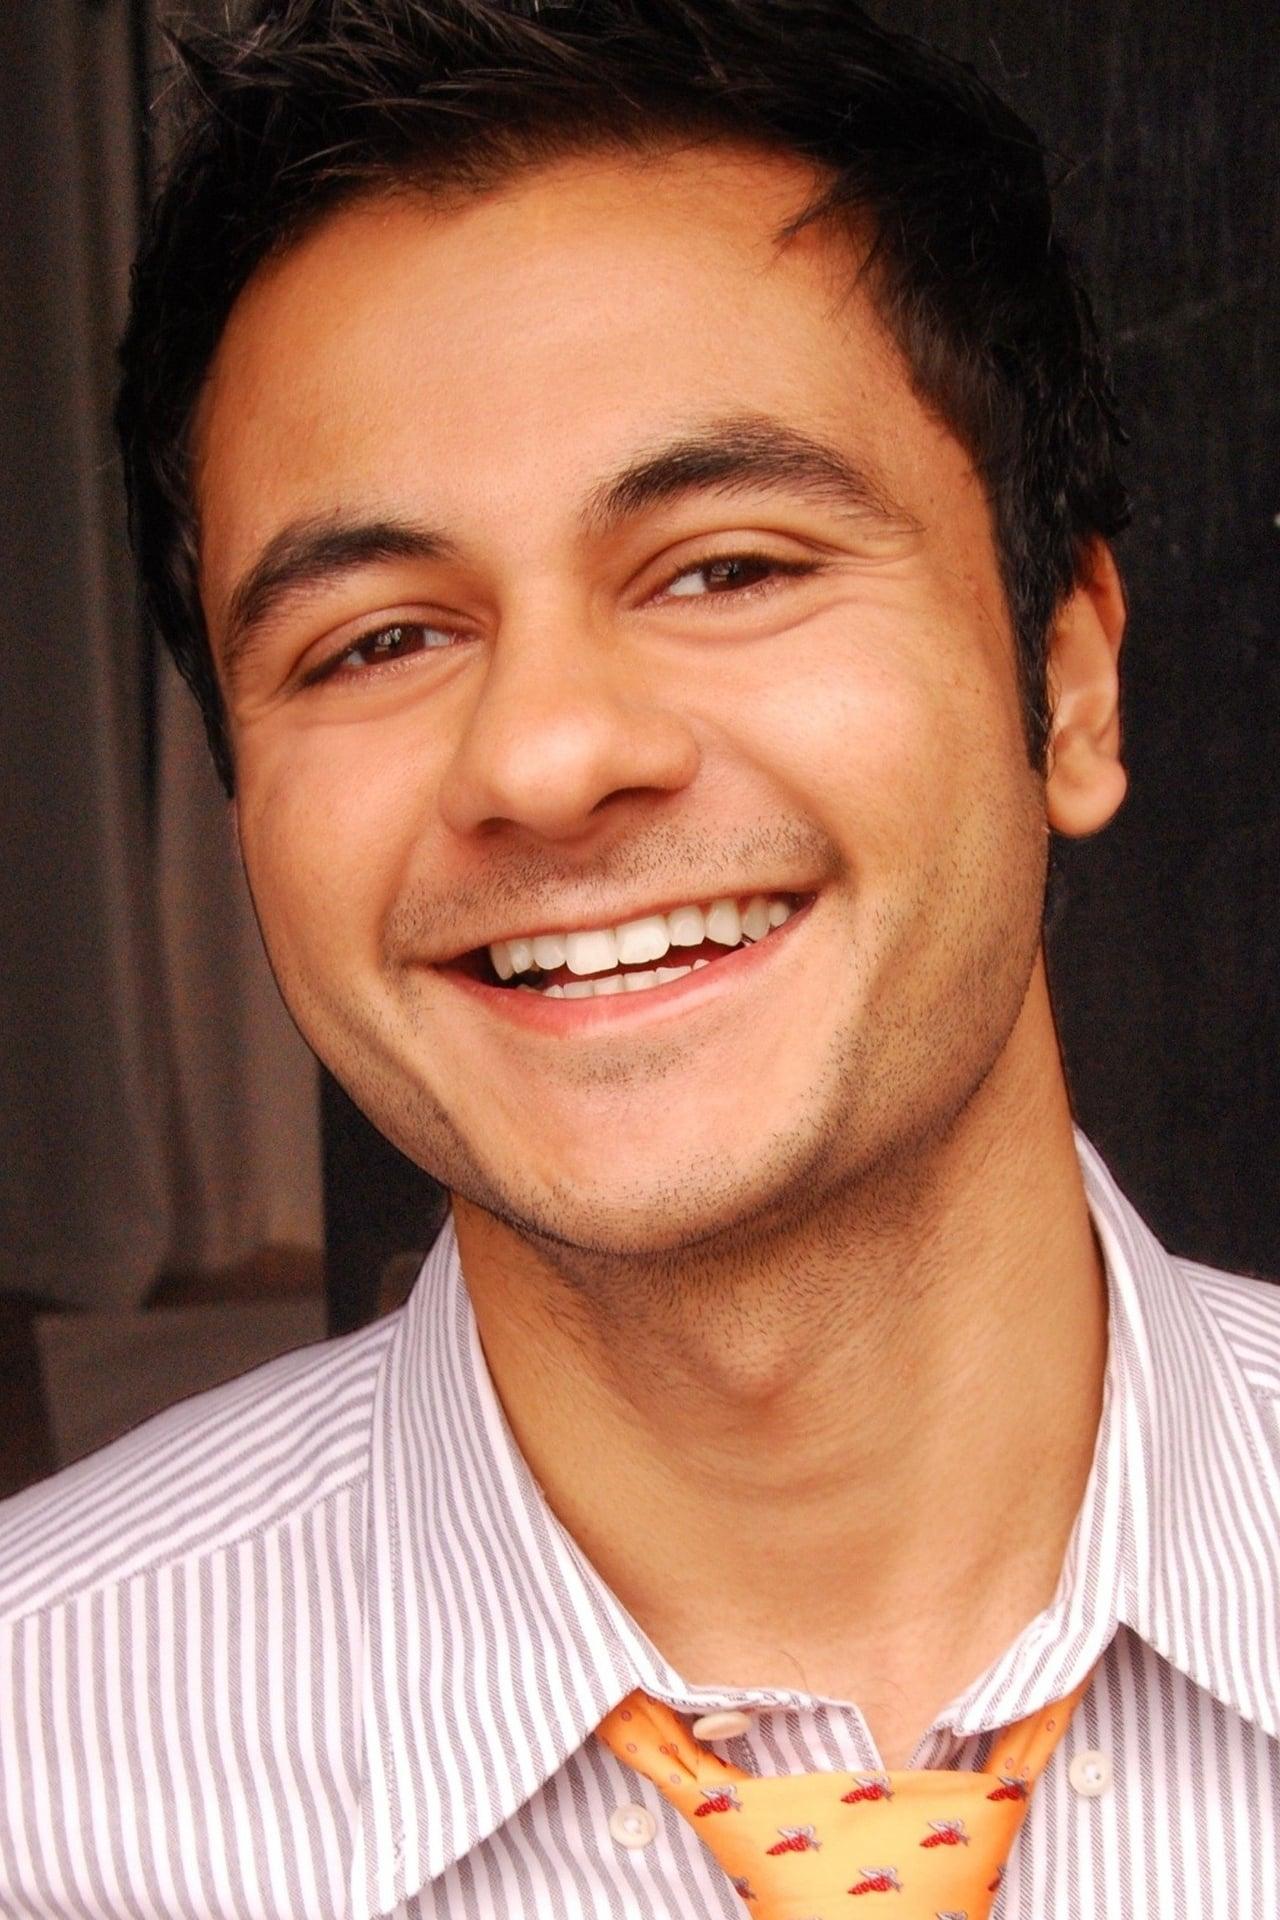 Mayank Bhatter